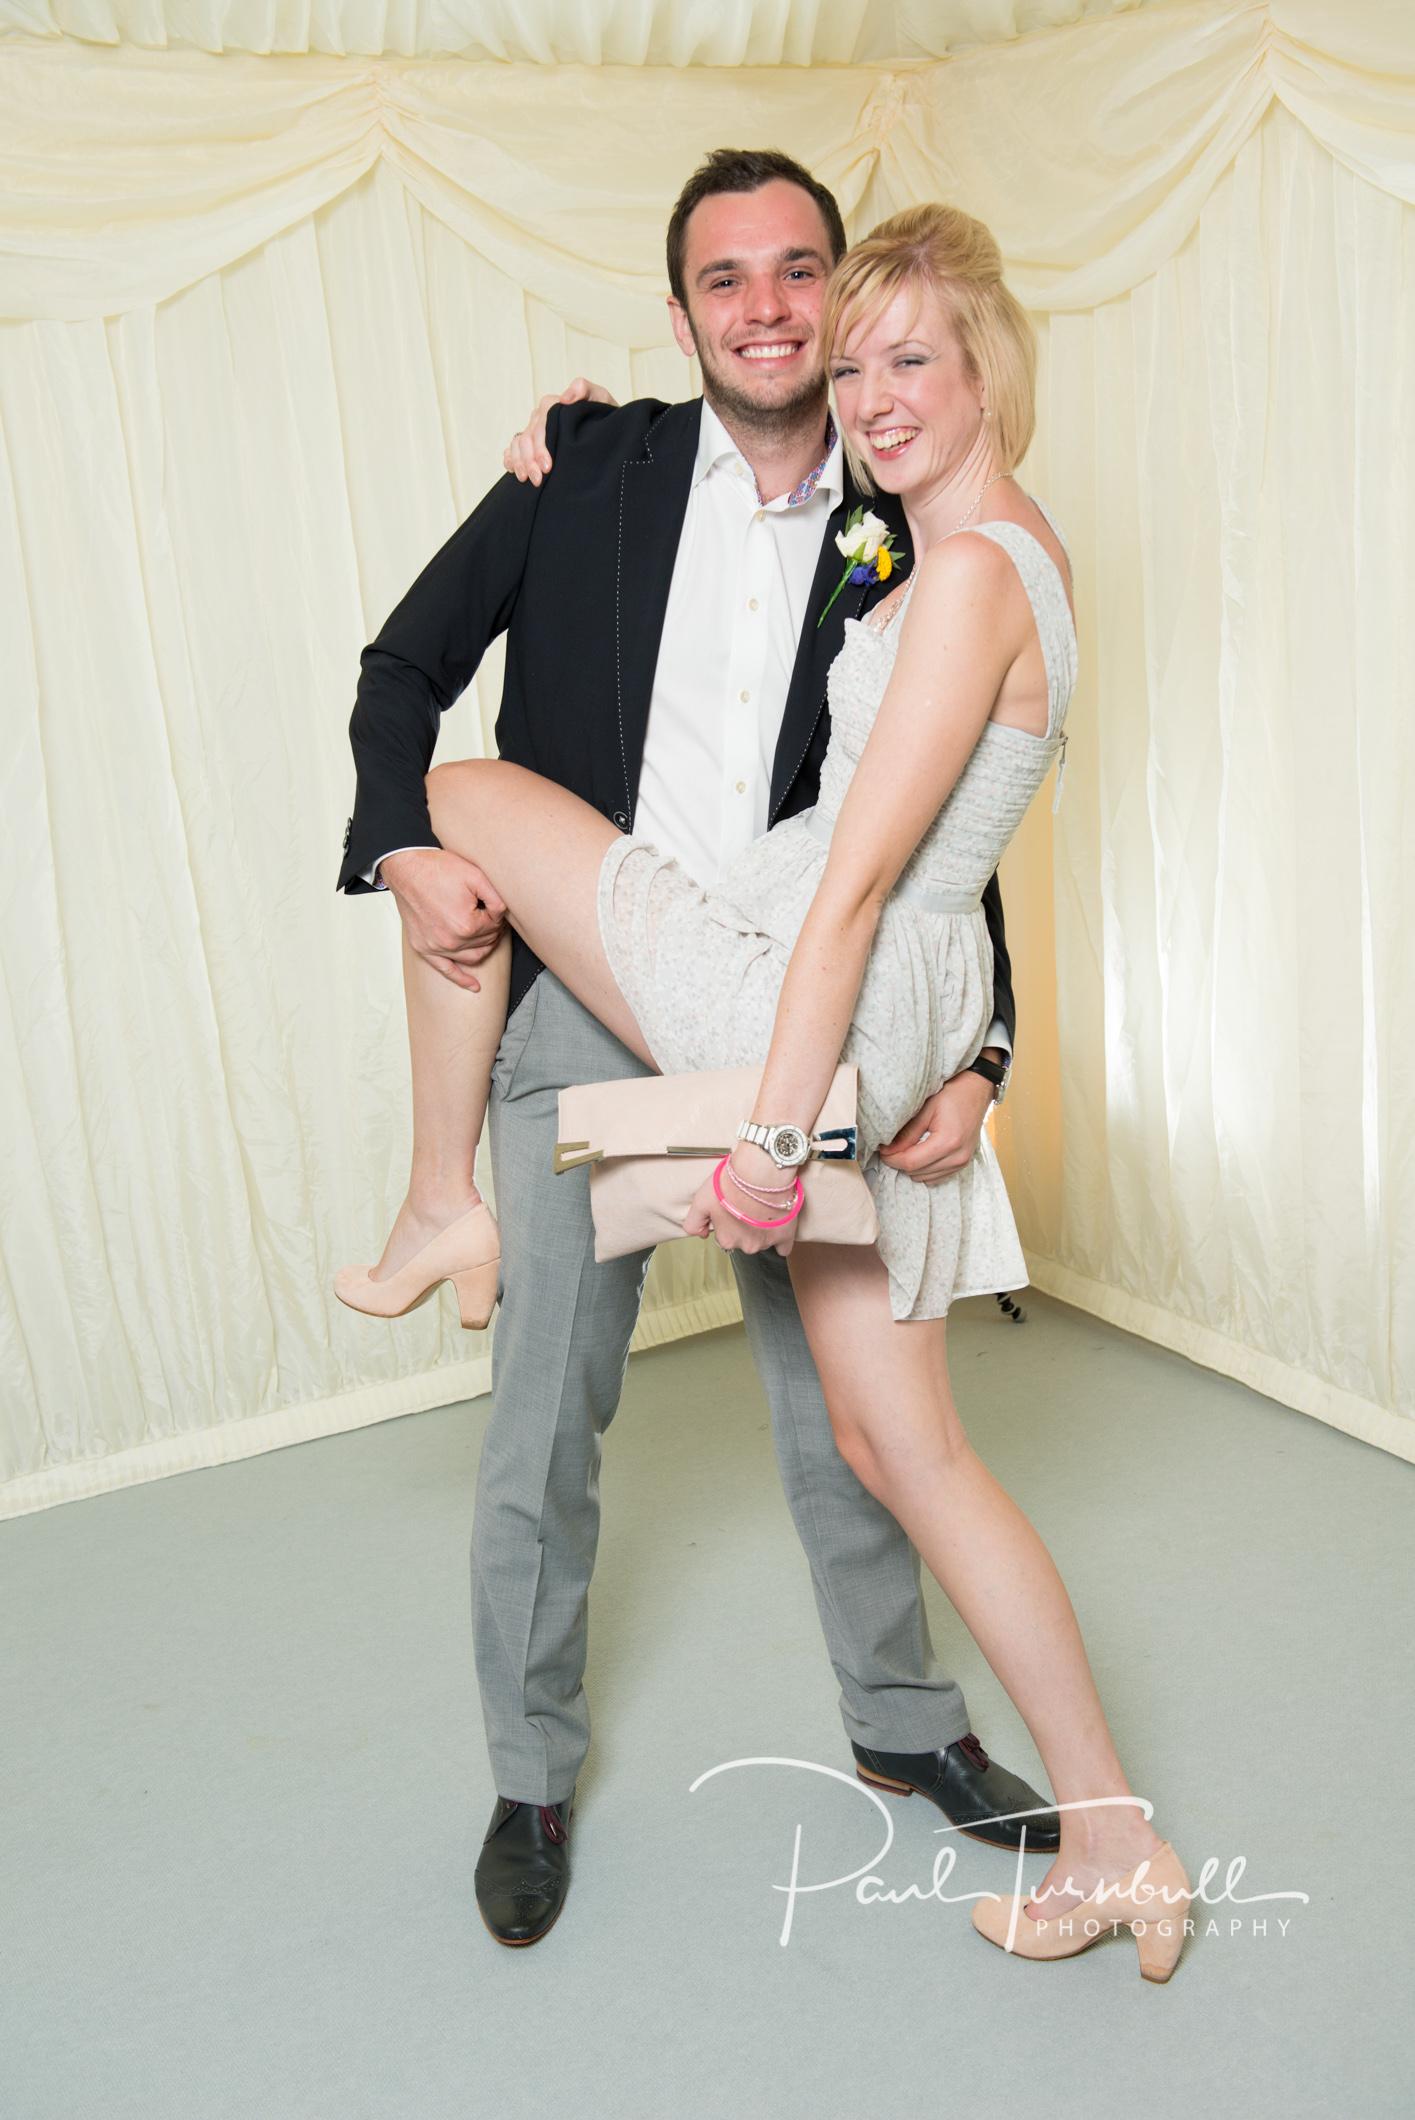 wedding-photography-star-inn-harome-yorkshire-020.jpg